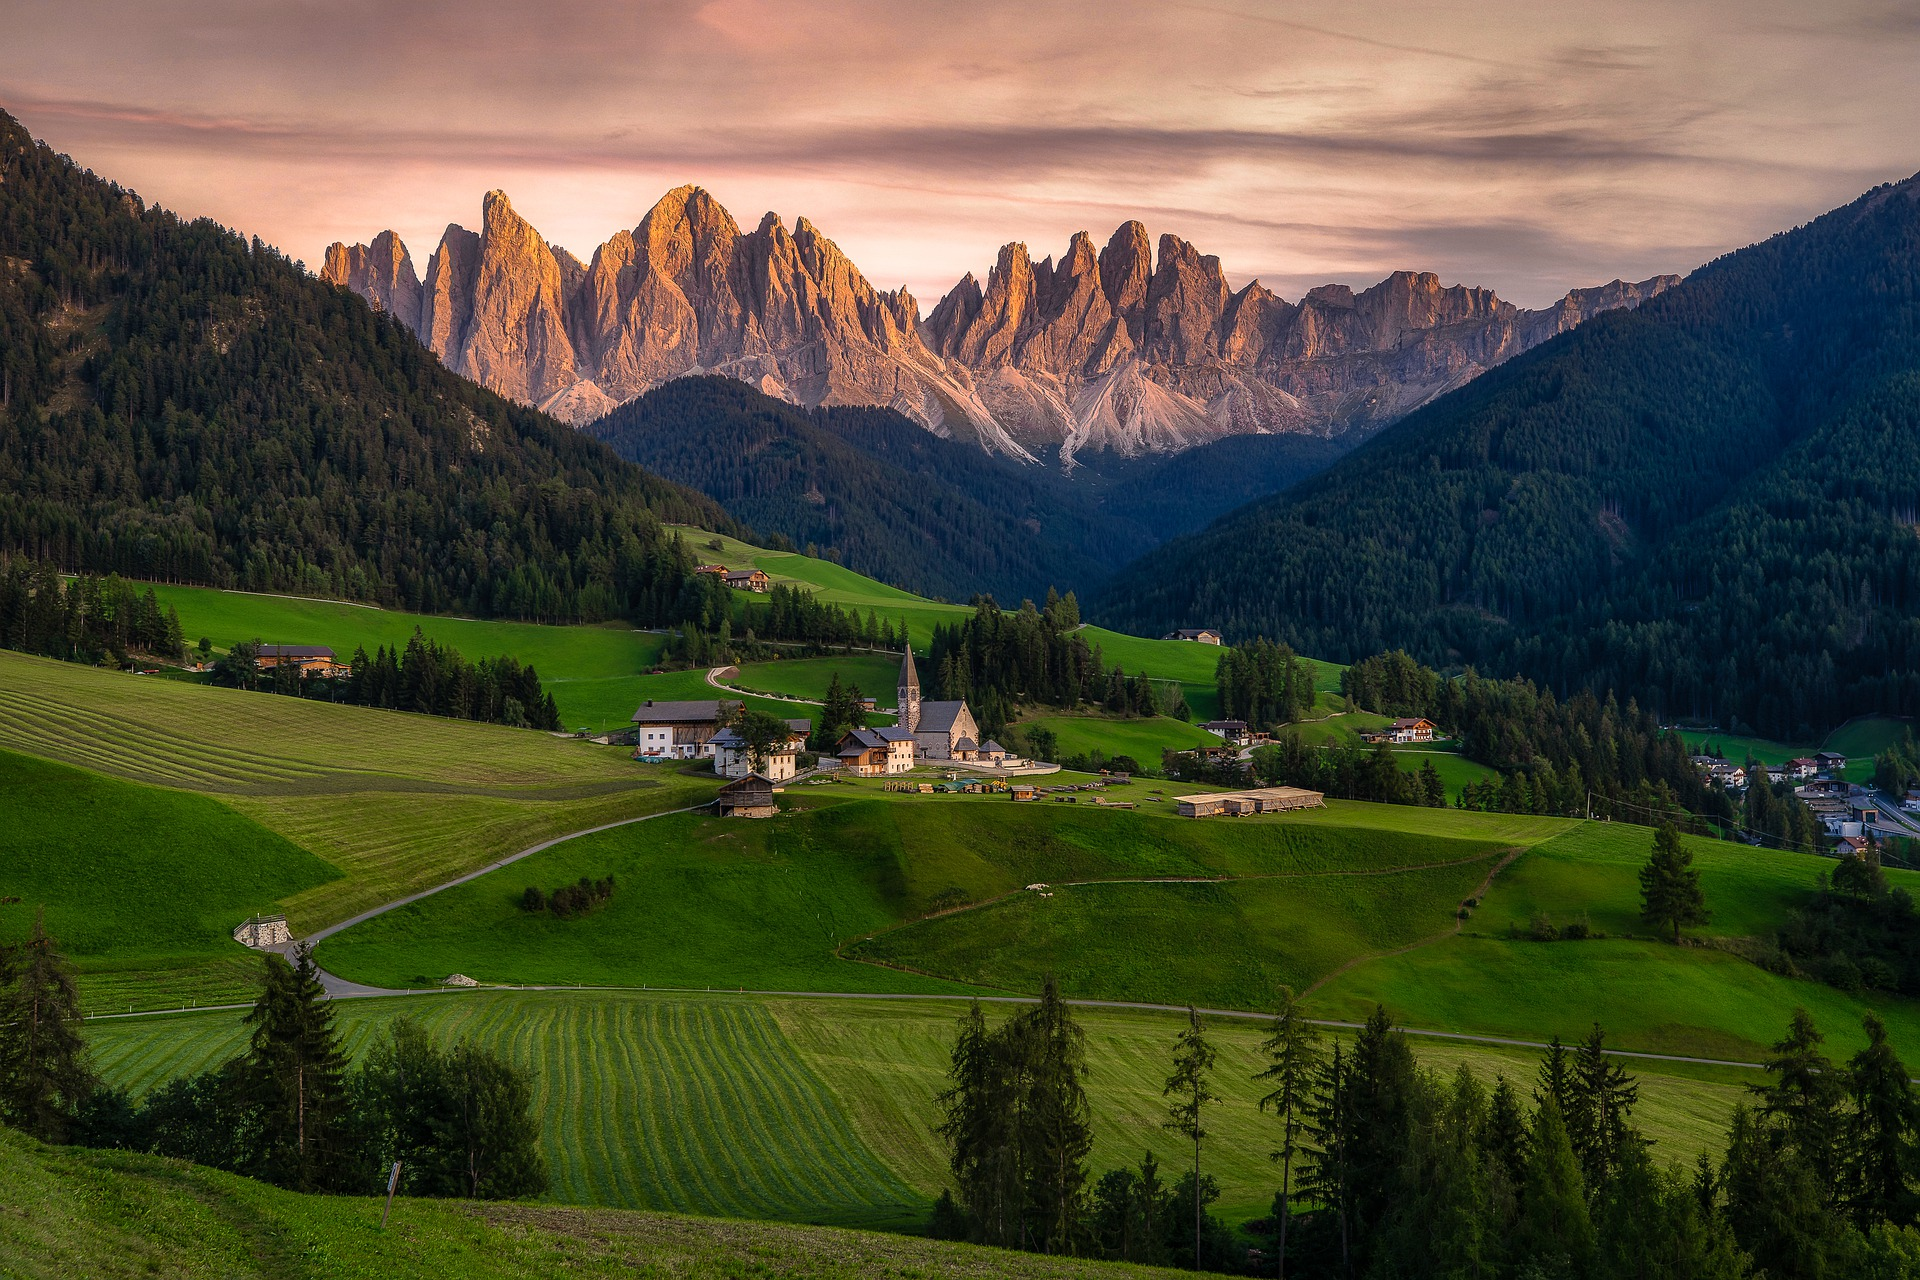 Roadtrips Europa: Italien ist ein echtes Highlight